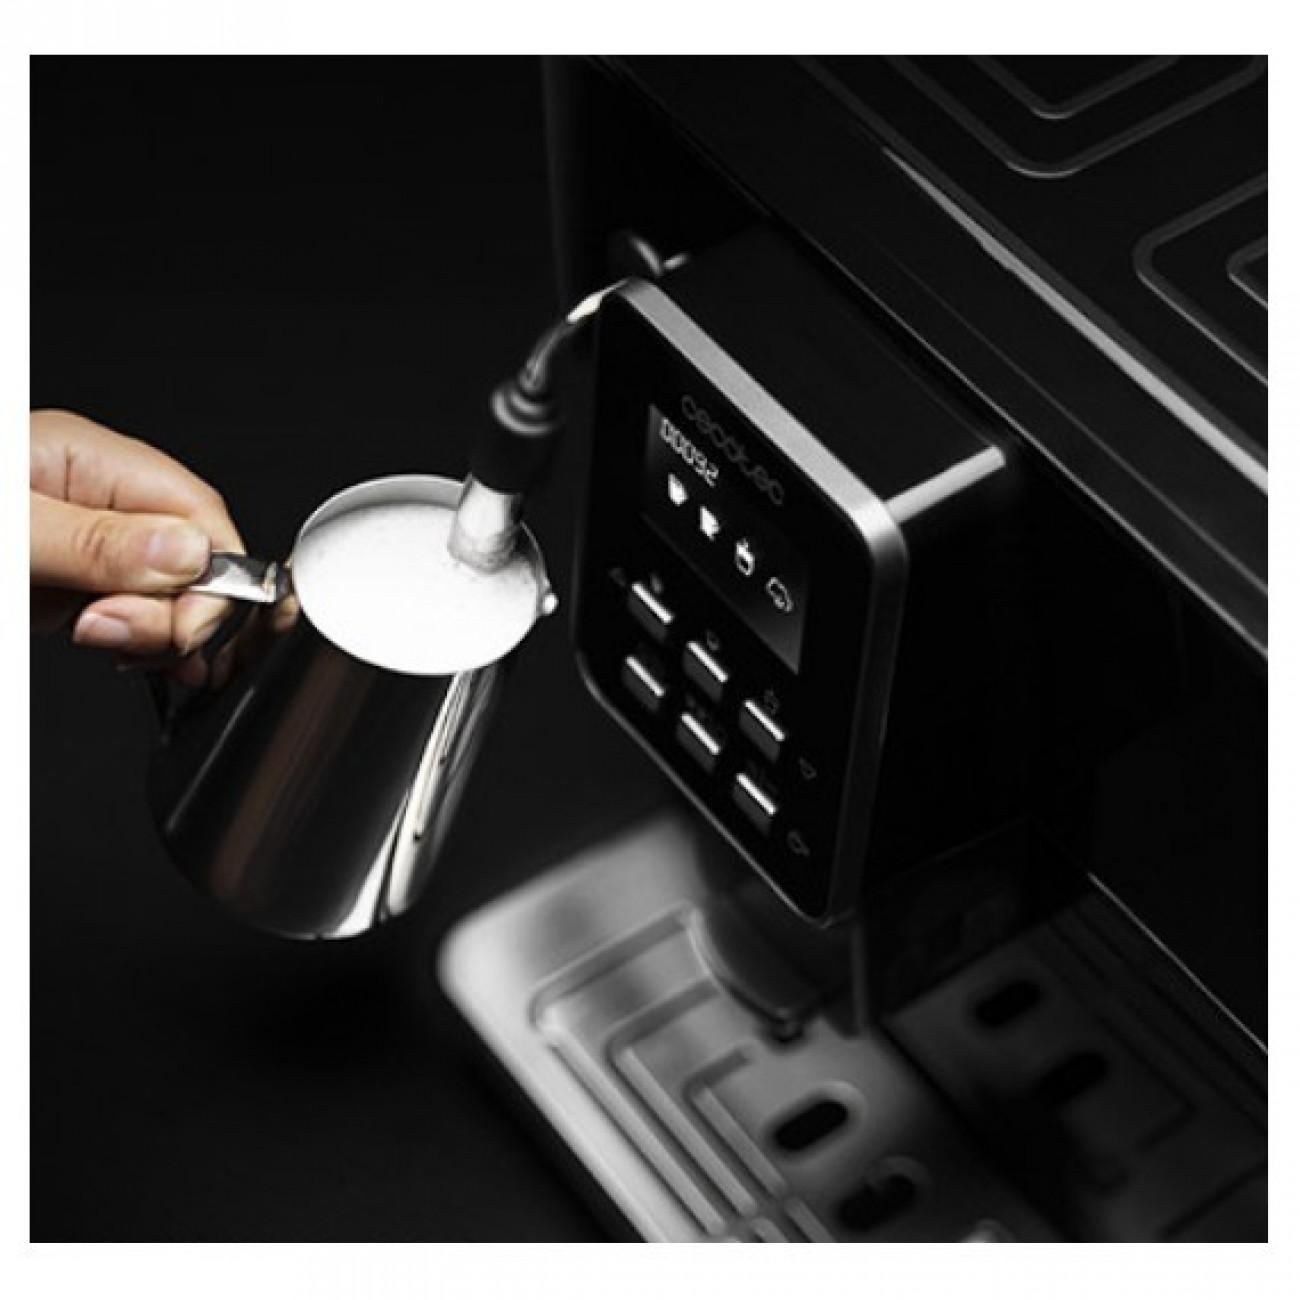 Кафеавтомат Cecotec Power Matic-ccino 6000 Serie Nera в Кафемашини -  | Alleop